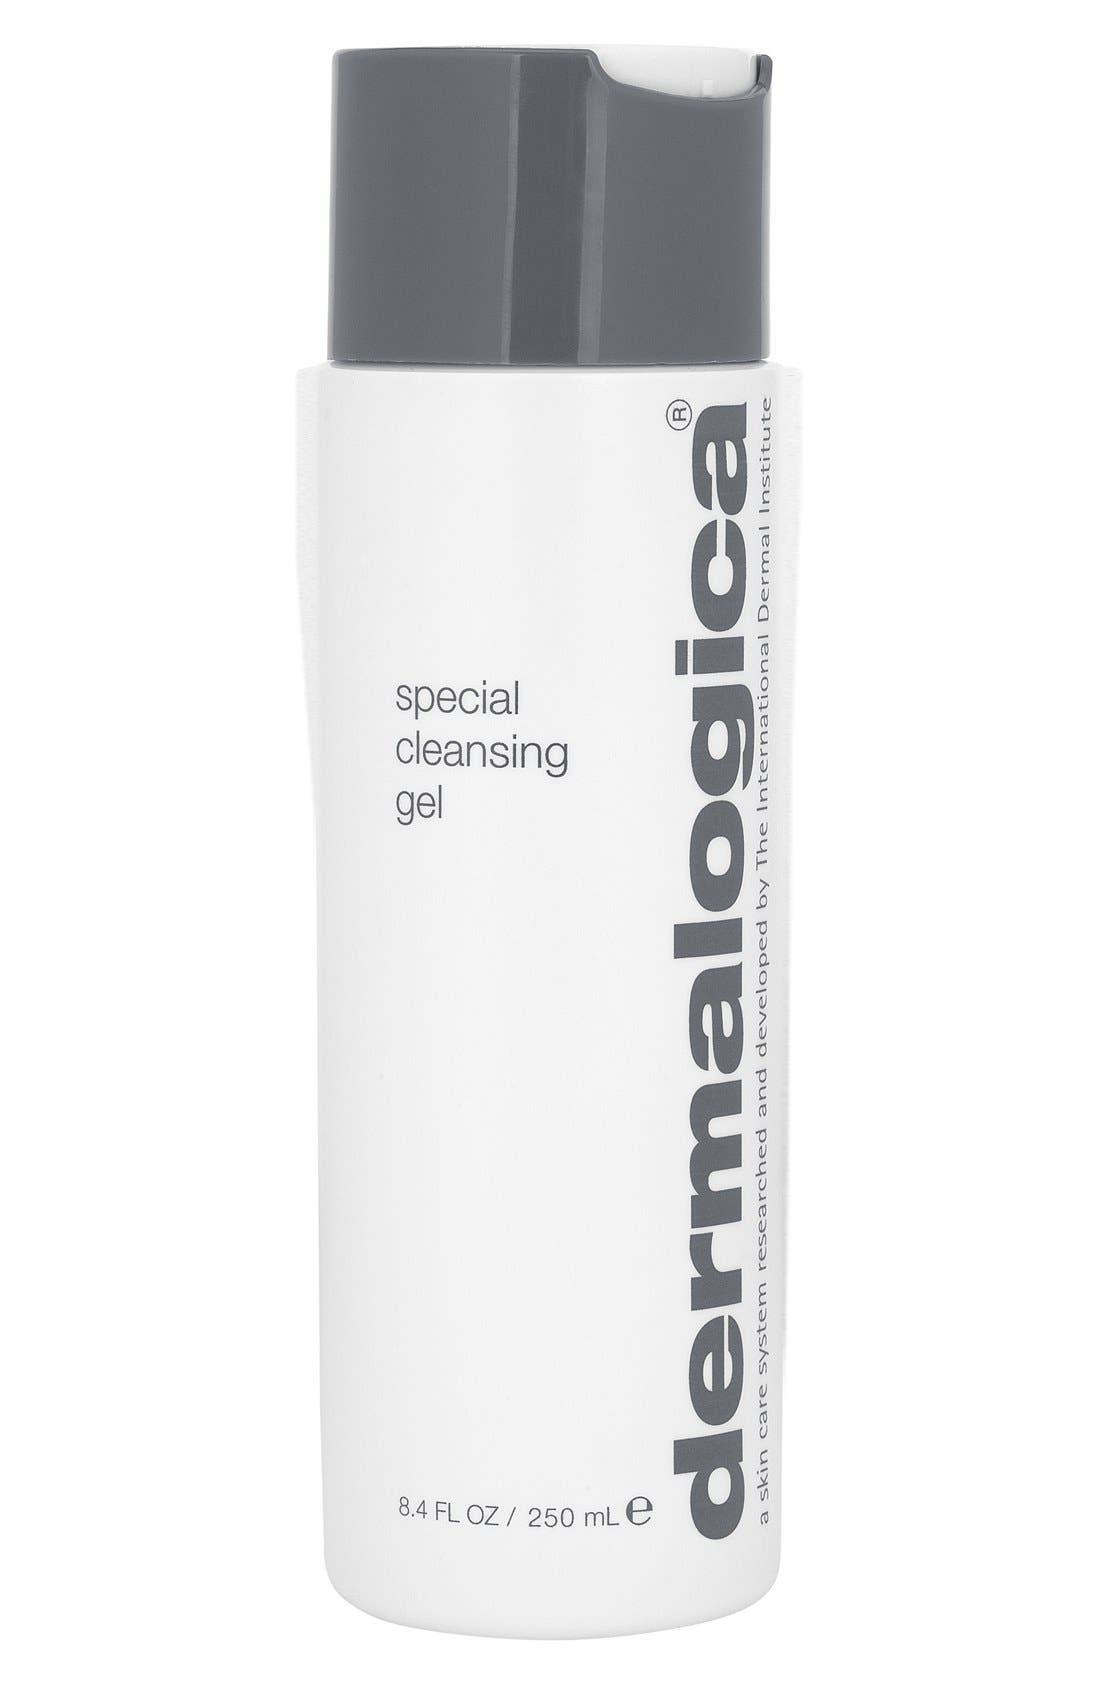 dermalogica® Special Cleansing Gel